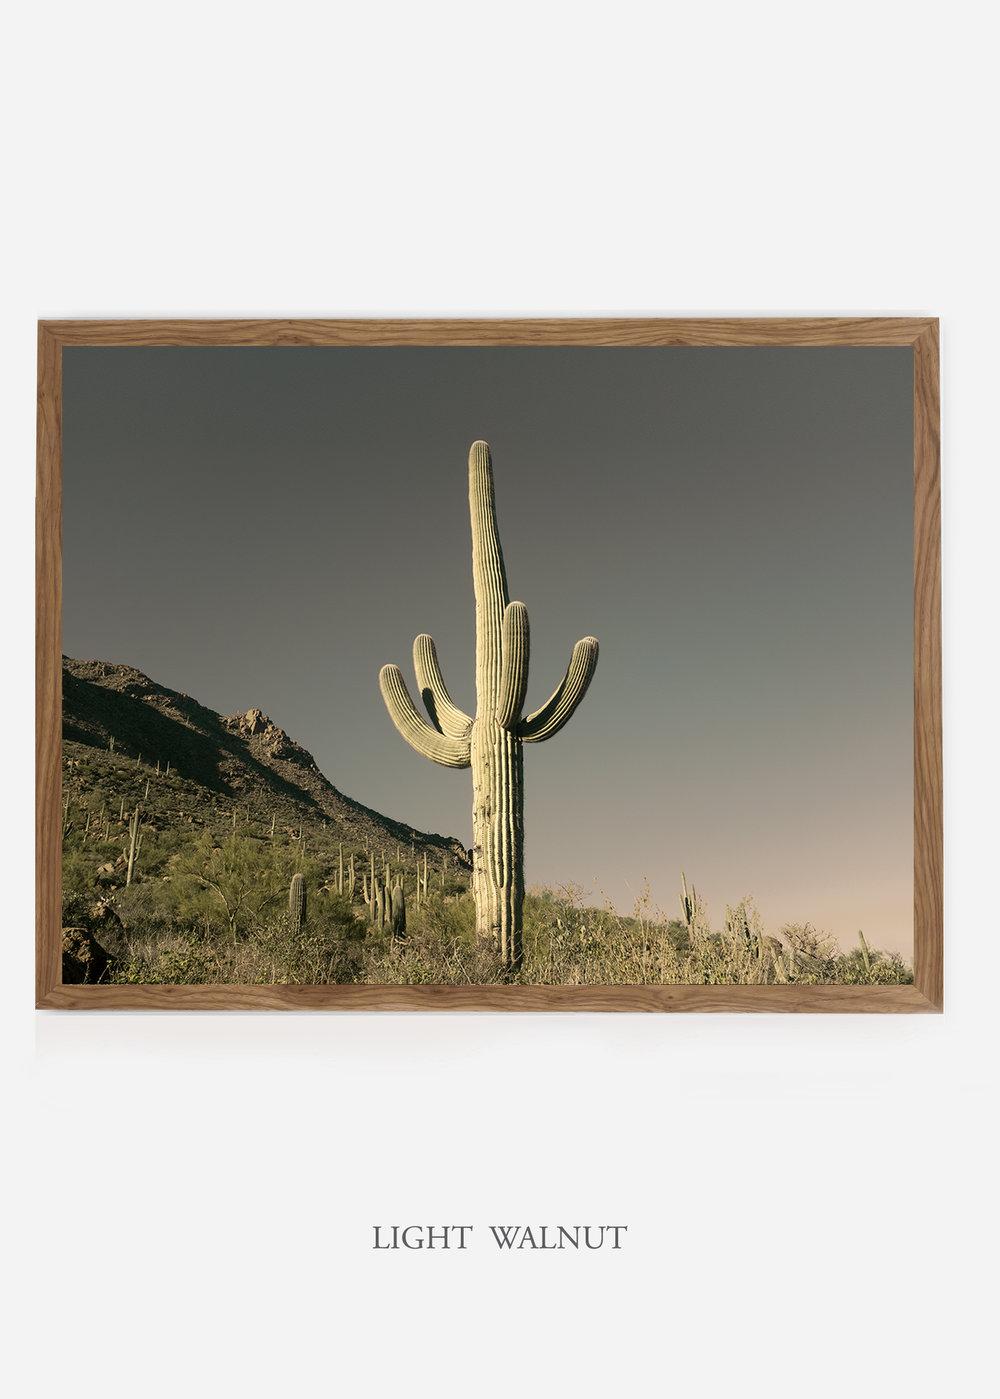 nomat_lightwalnutframe-saguaroNo.19-wildercalifornia-art-wallart-cactusprint-homedecor-prints-arizona-botanical-artwork-interiordesign.jpg